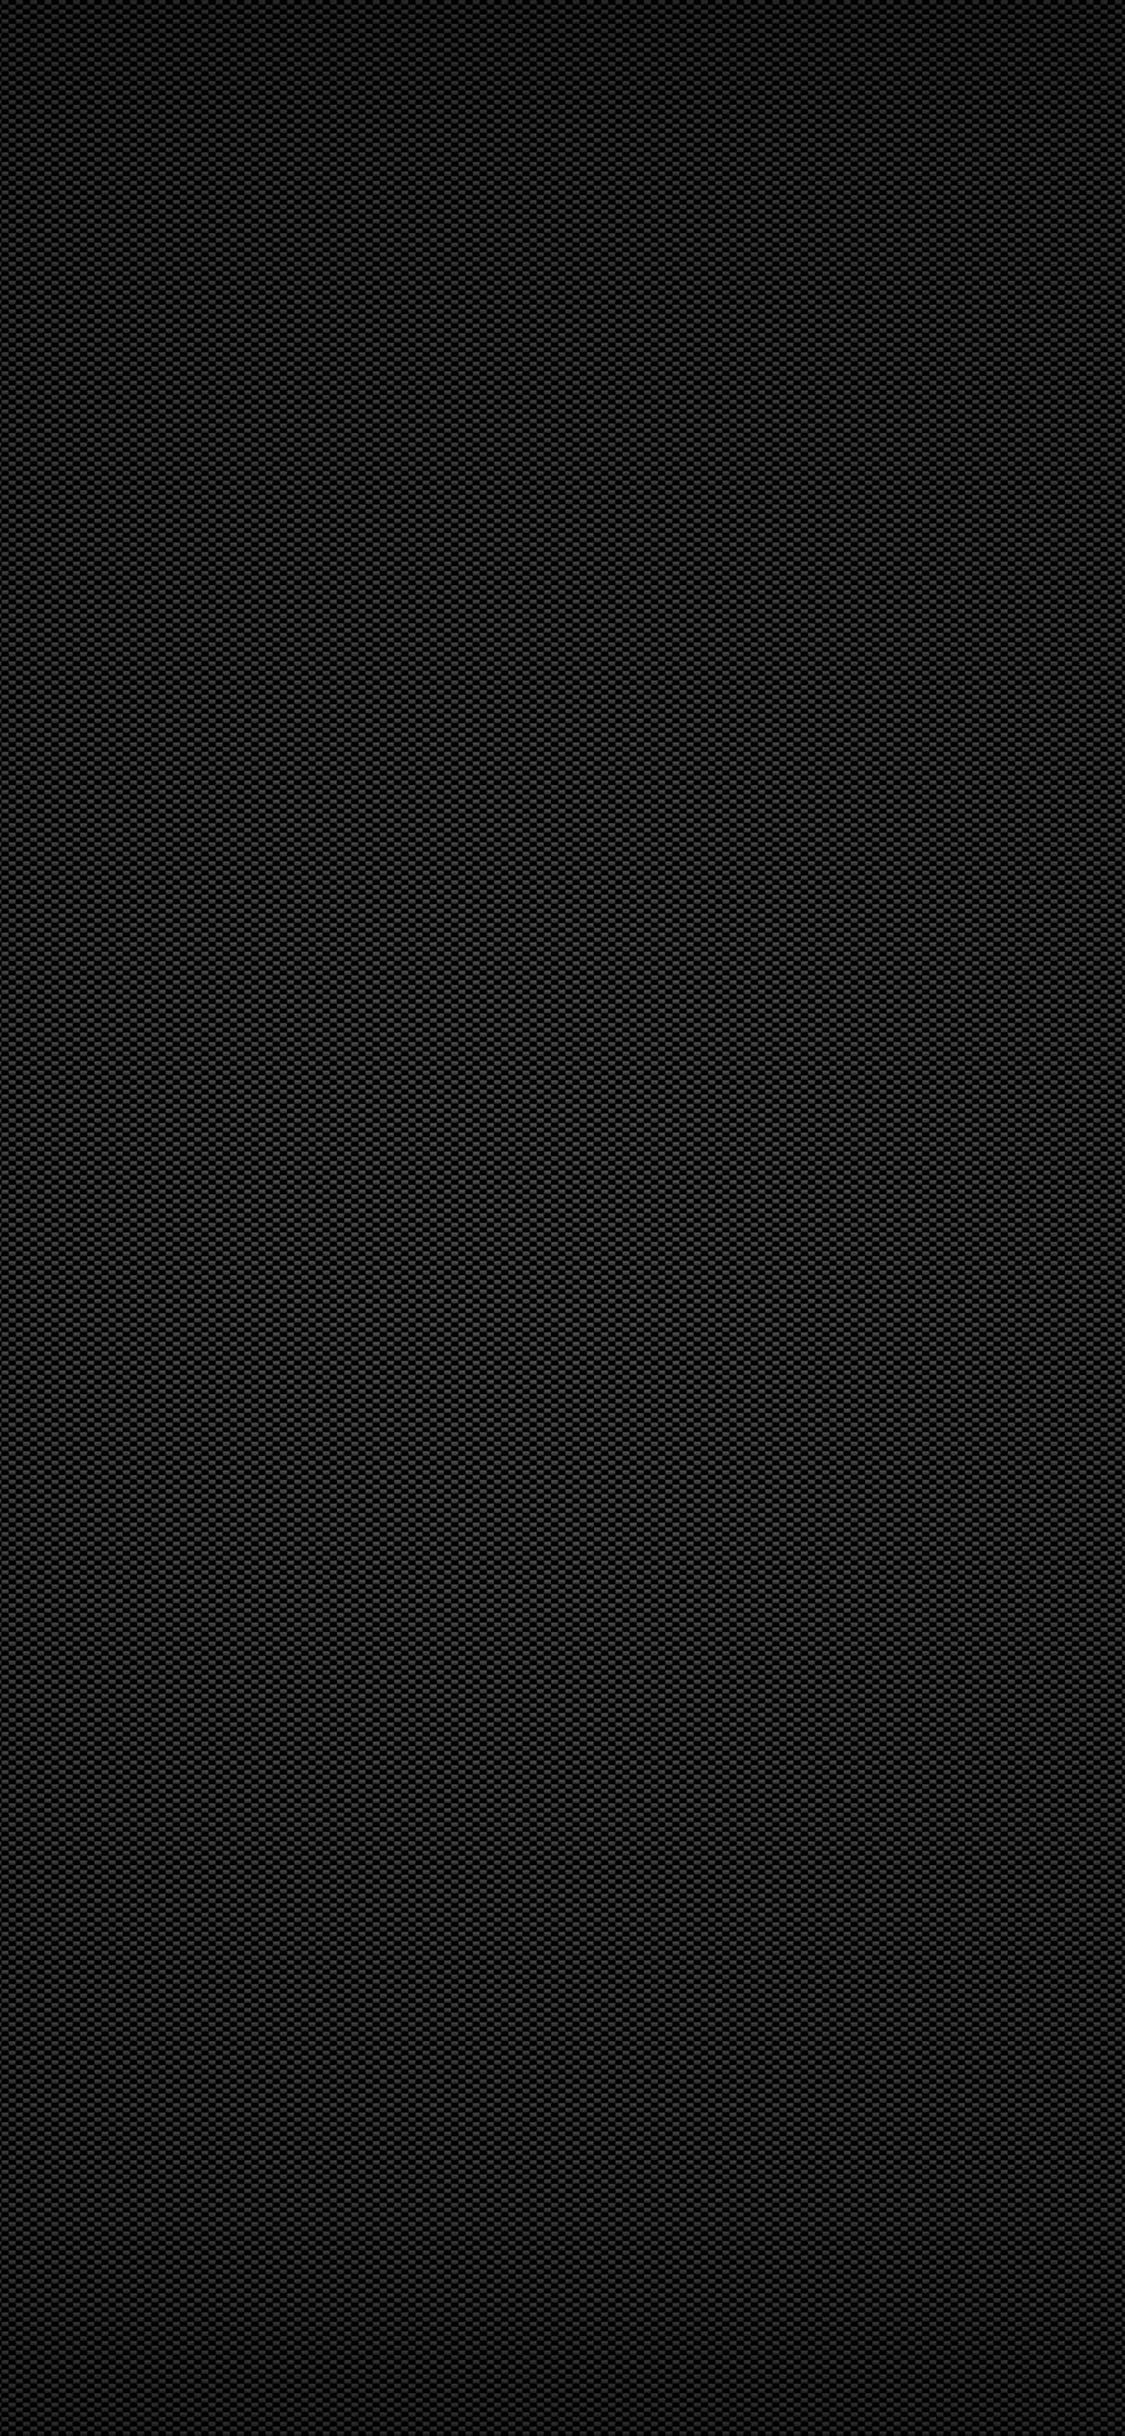 iPhoneXpapers.com-Apple-iPhone-wallpaper-vb73-wallpaper-black-pattern-olive